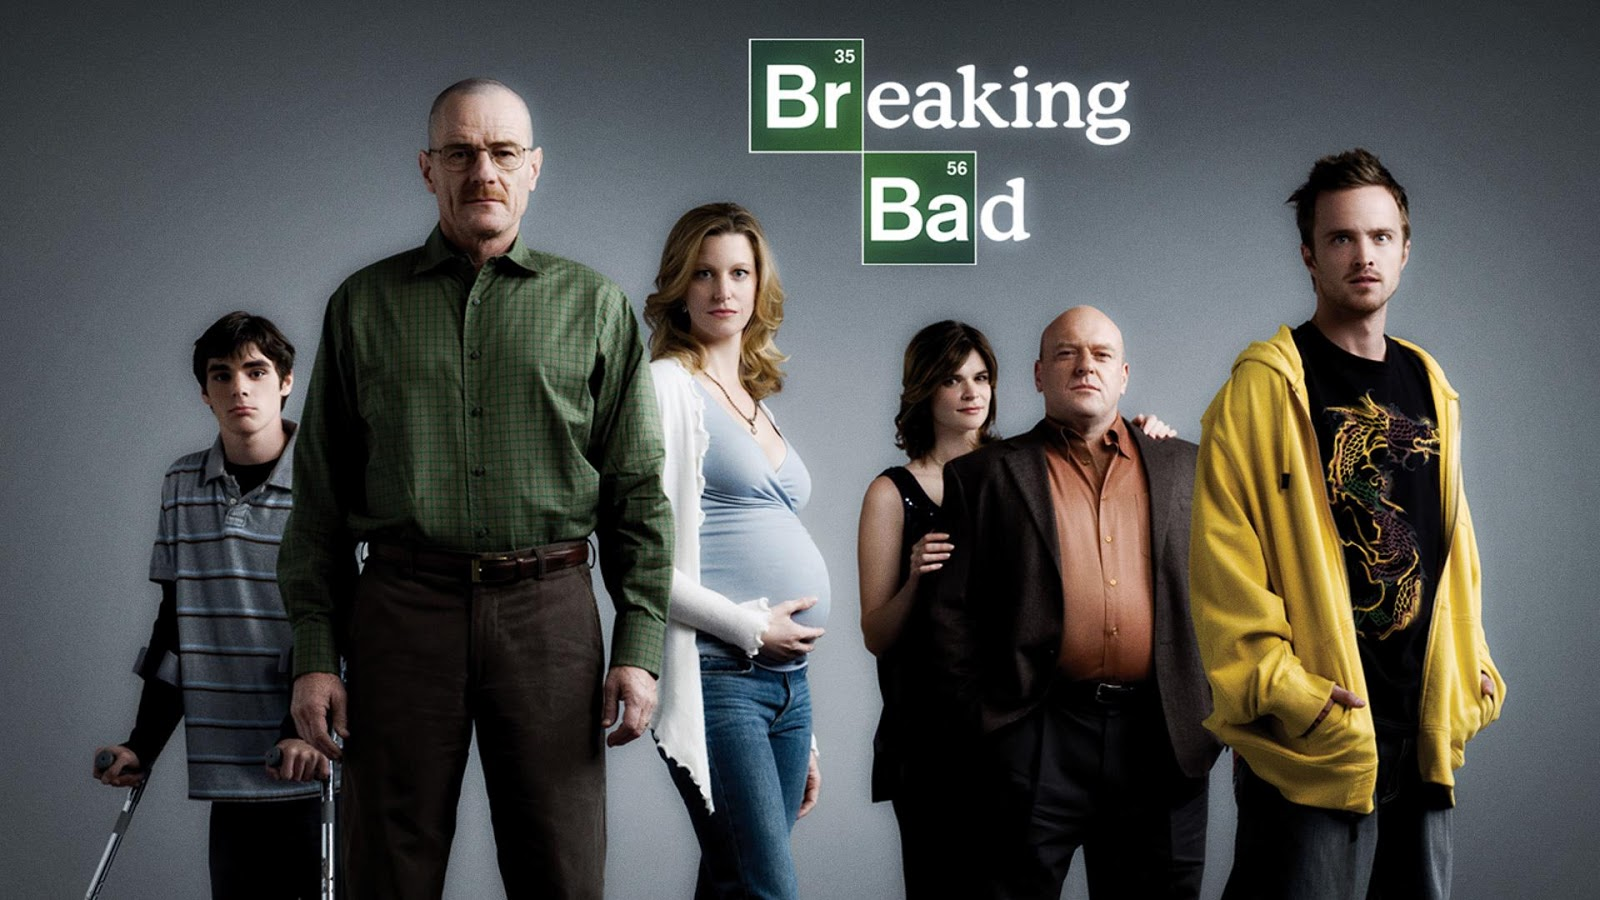 Breaking bad wallpaper breaking bad wallpapers - Bad wallpaper ...